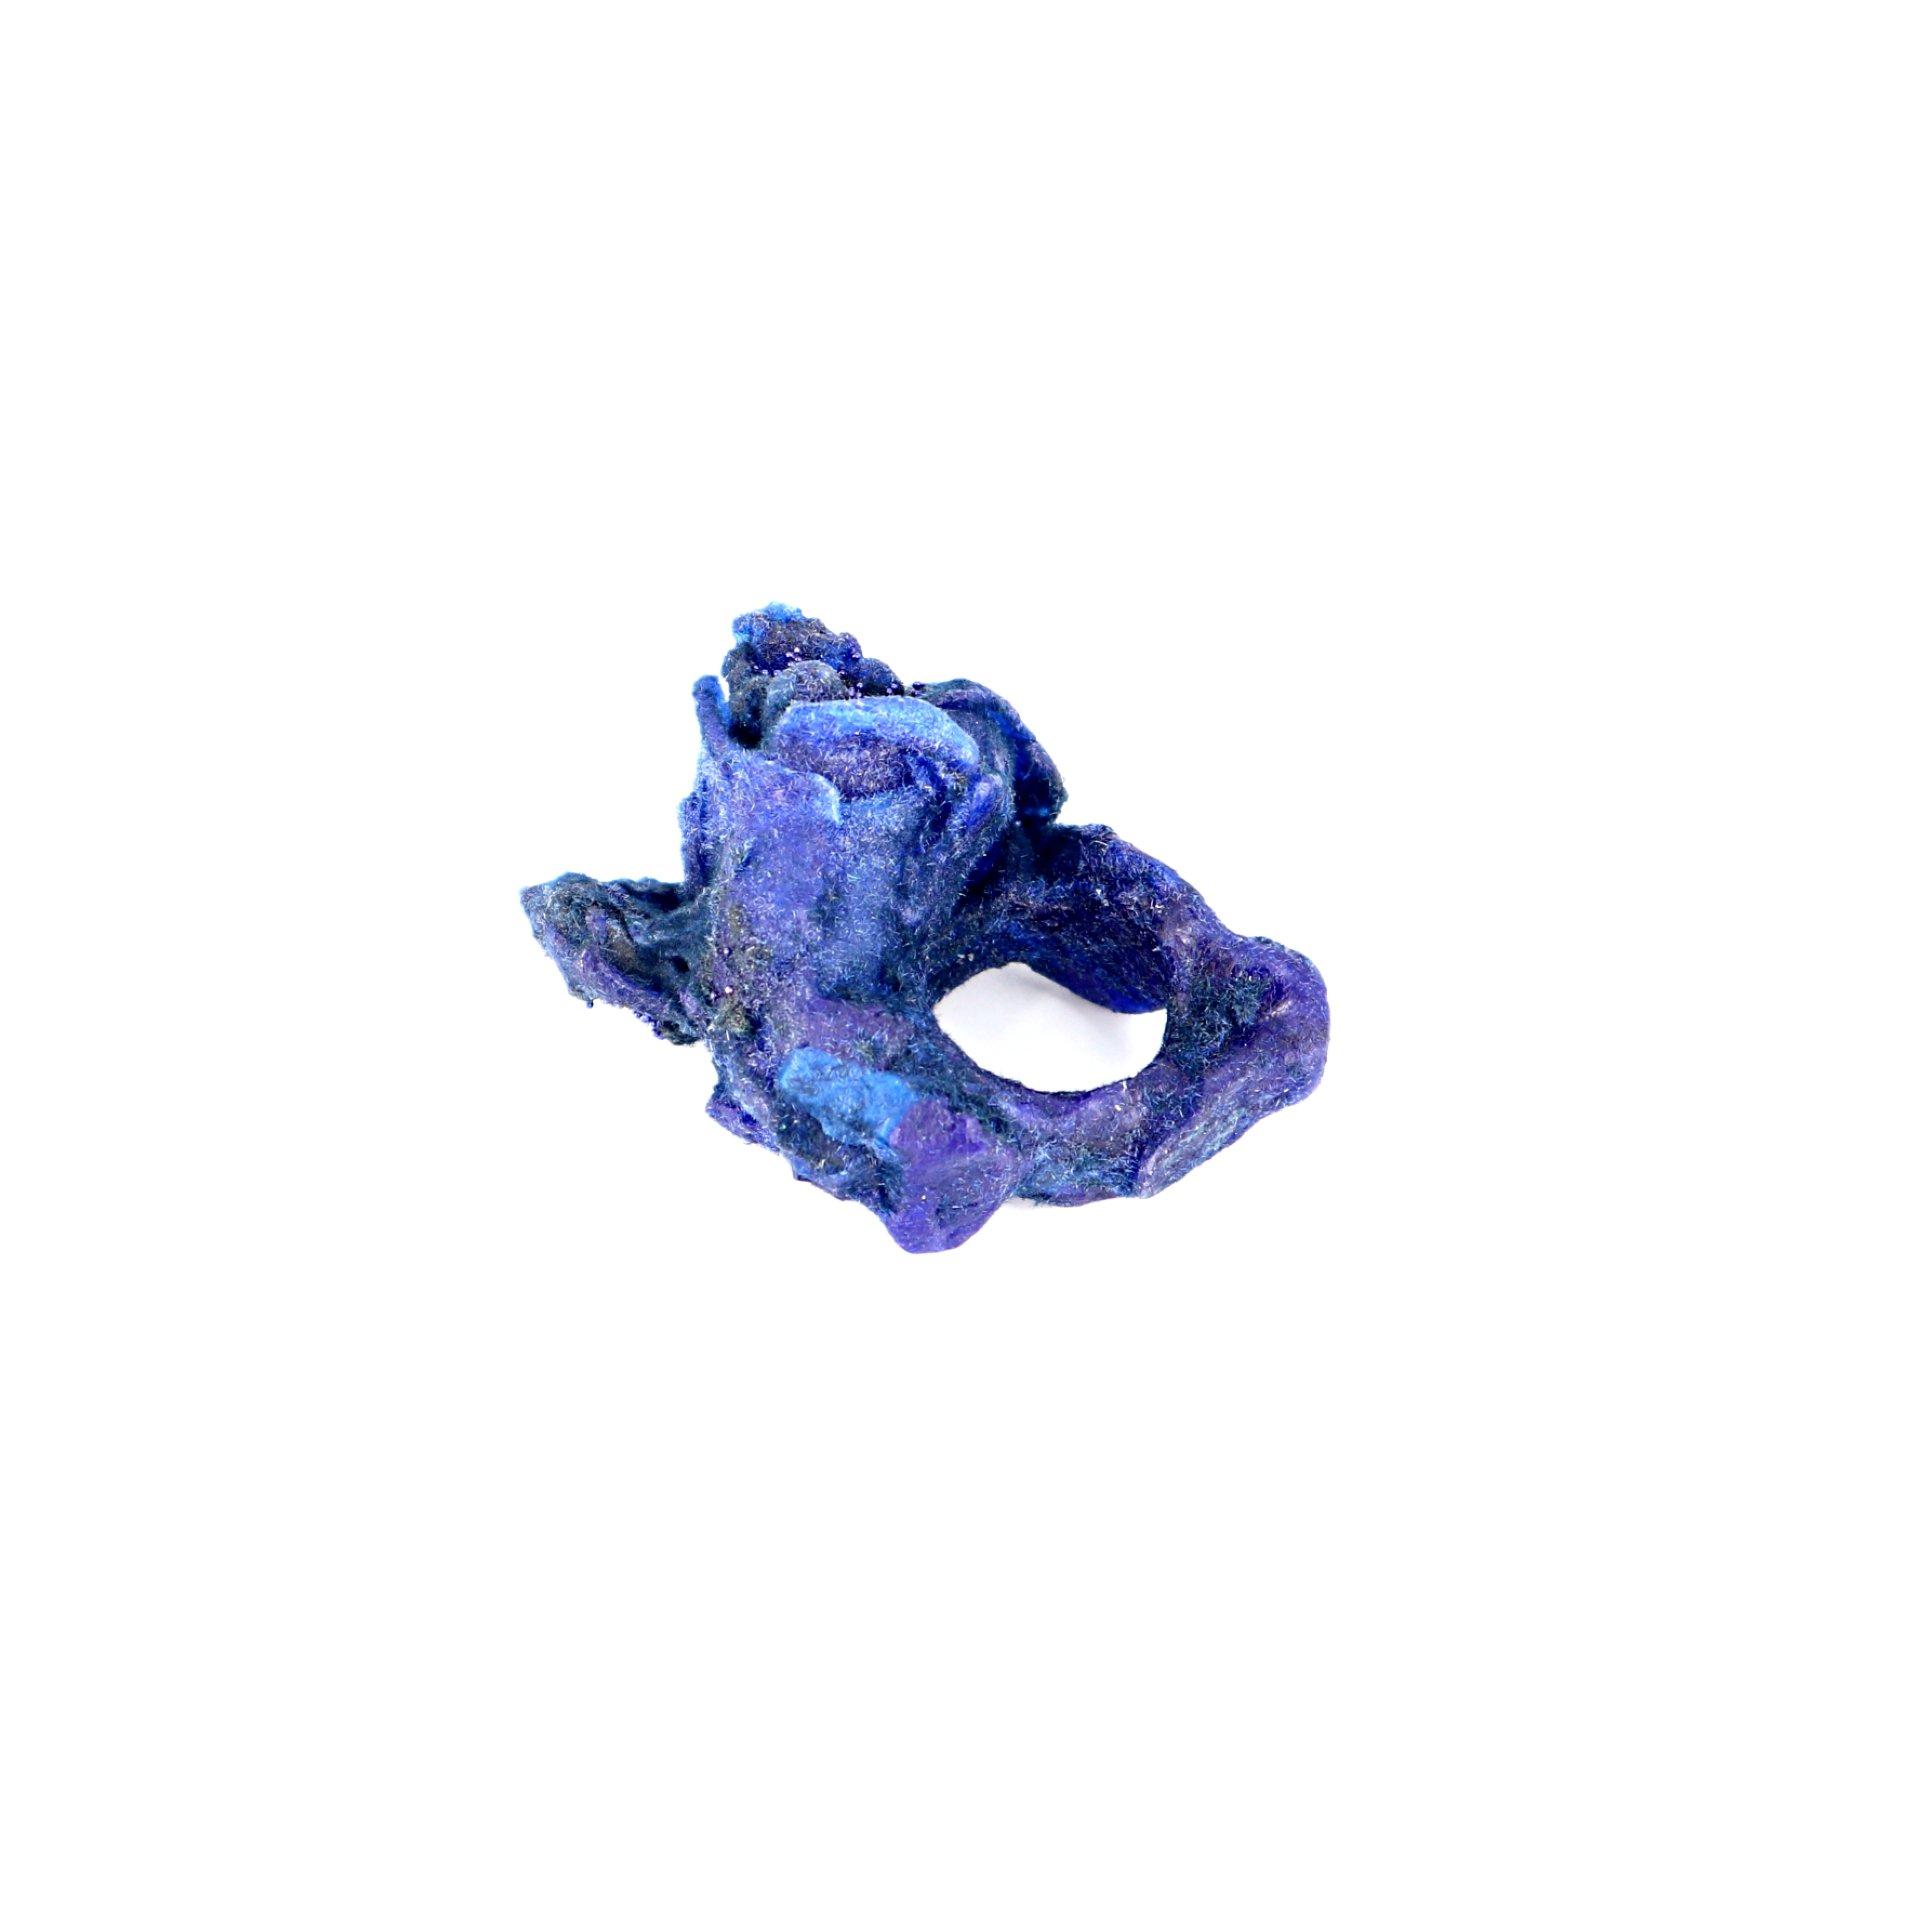 RESIN INTERMEZZO - BLU RING NO.2